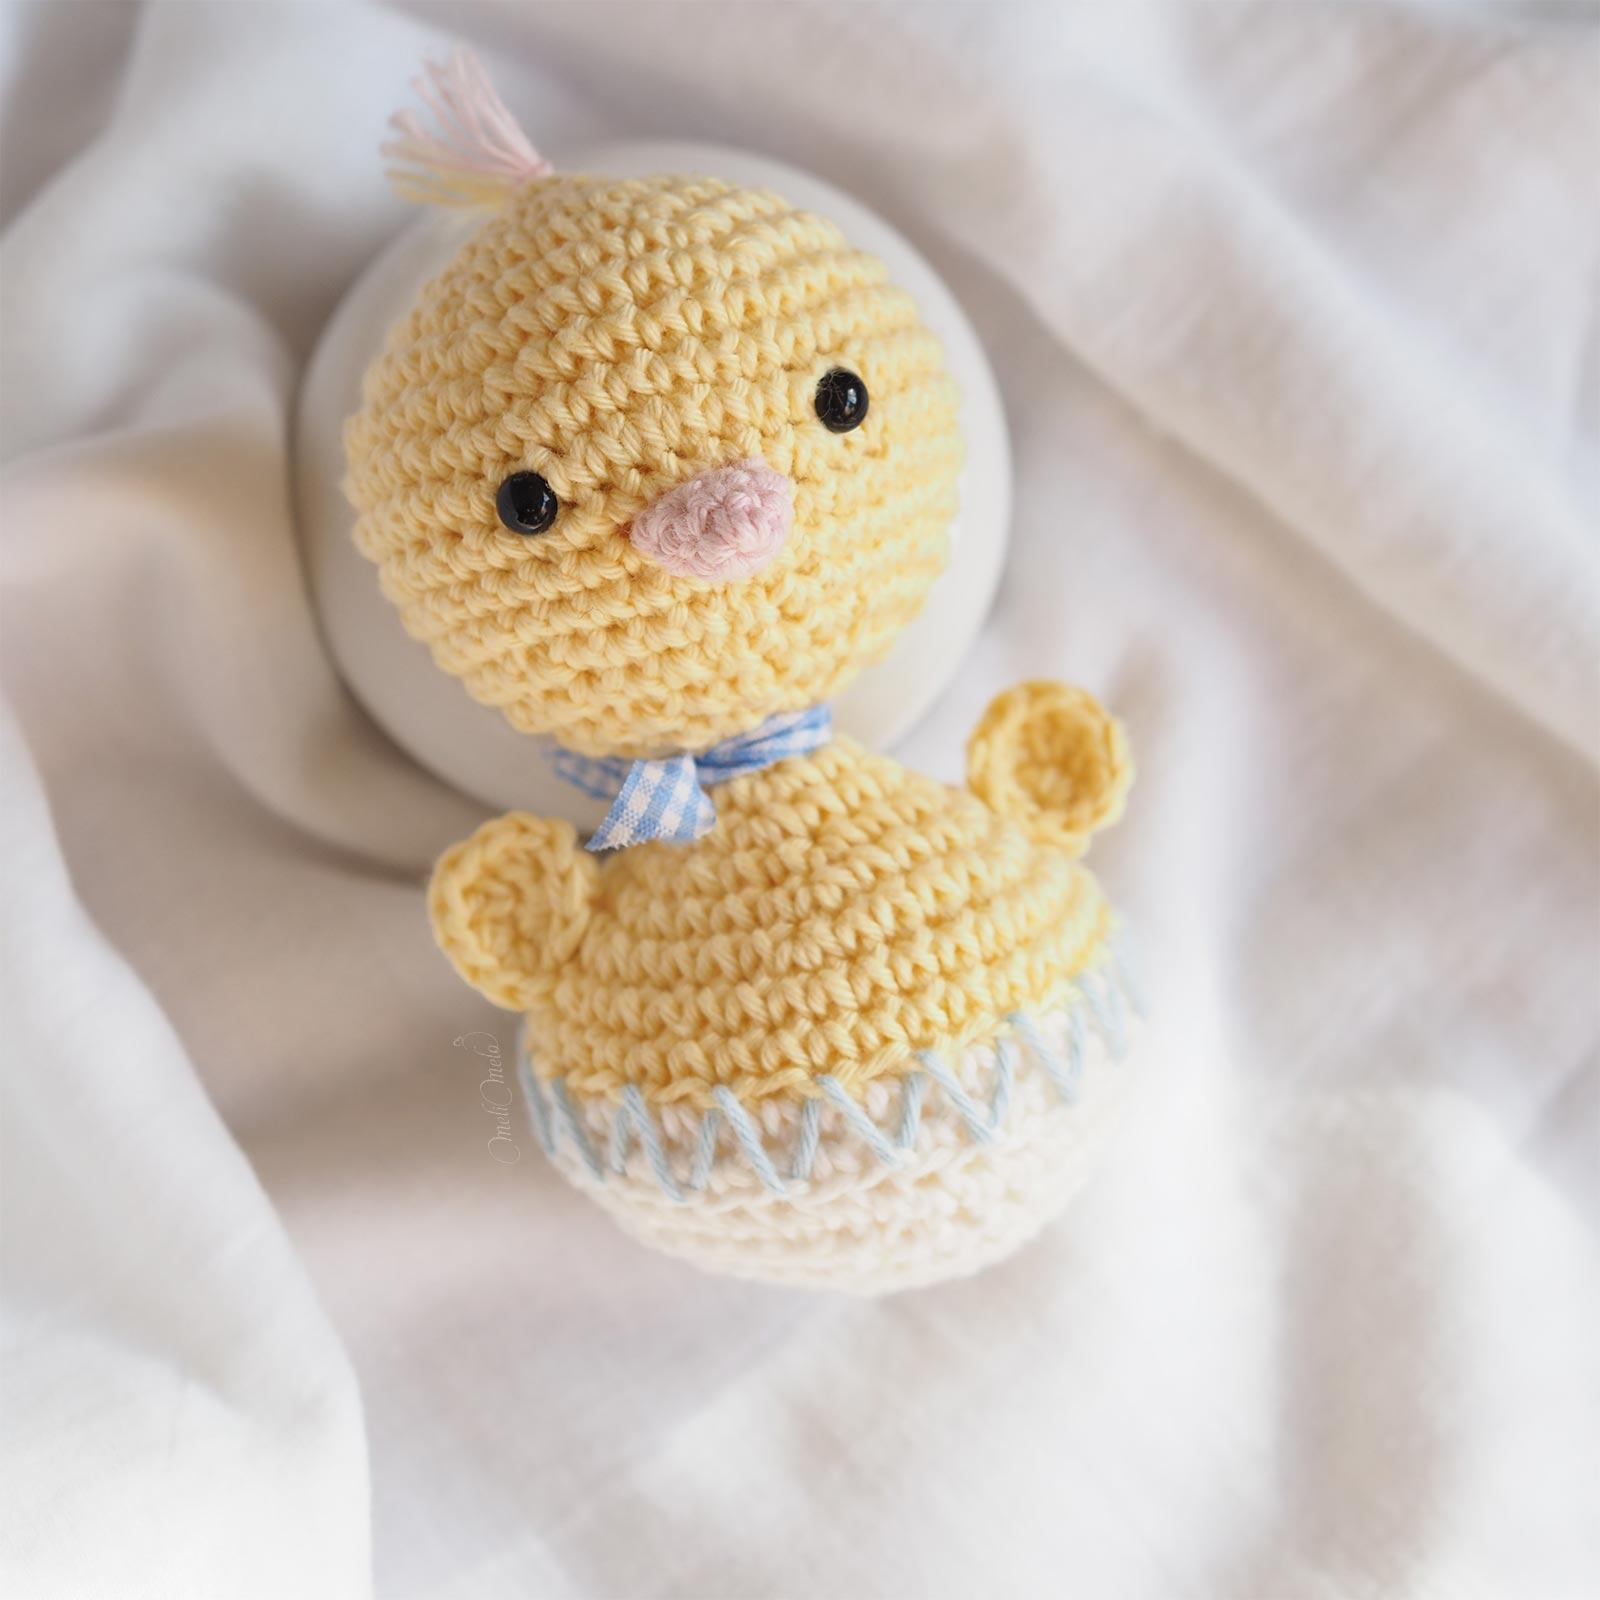 crochet-amigurumi-ricorumi-vichy-poussin-oeuf-coquille-pâques-laboutiquedemelimelo